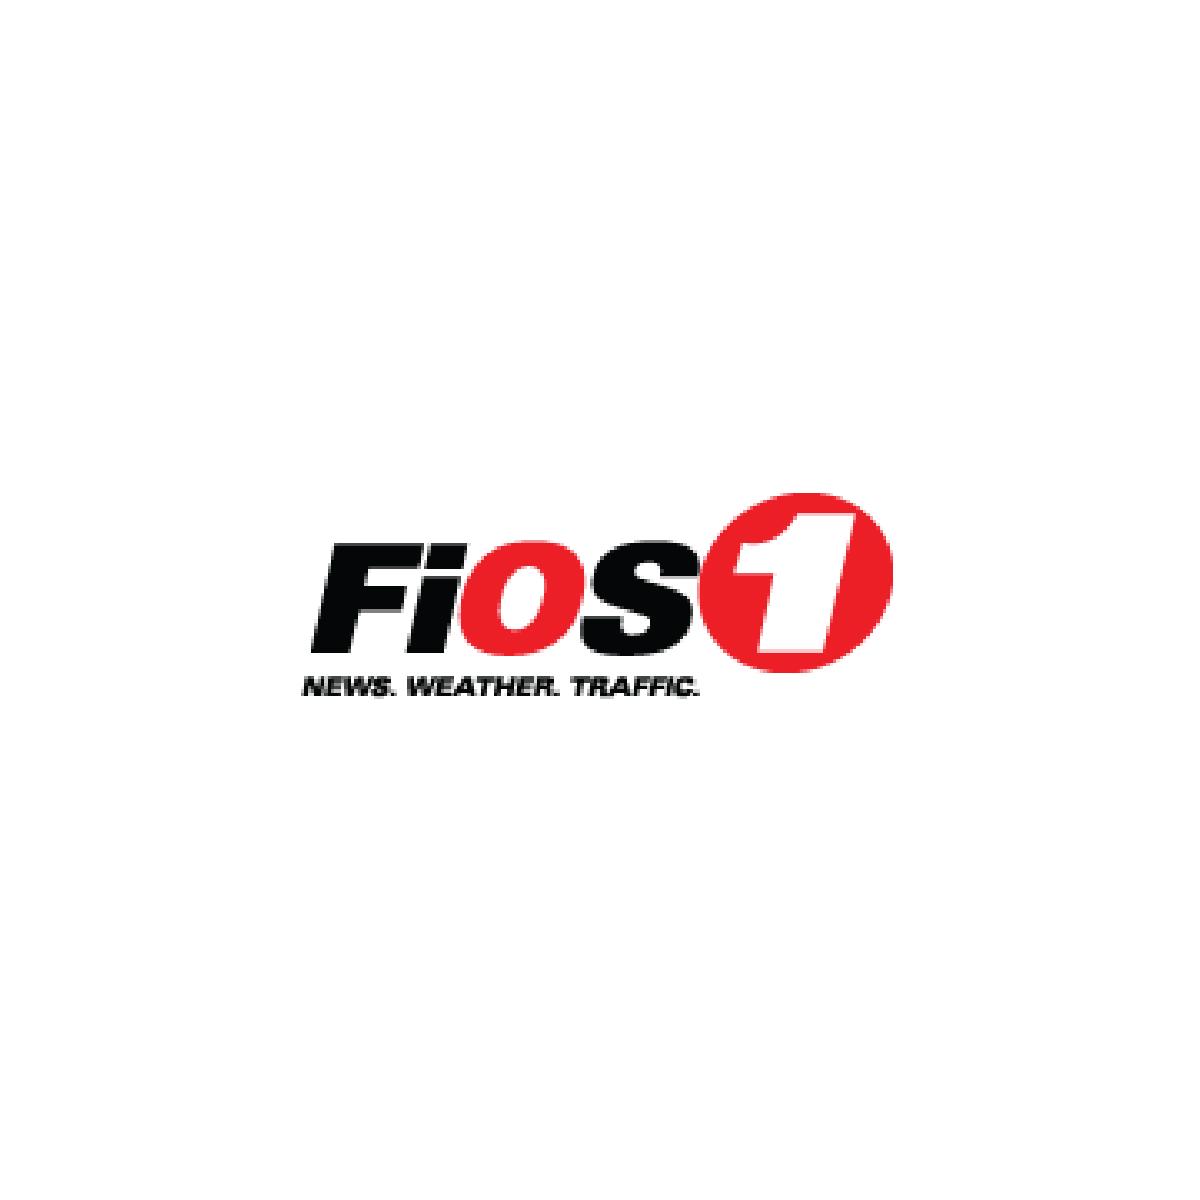 Website_Press_Fios-01.jpg